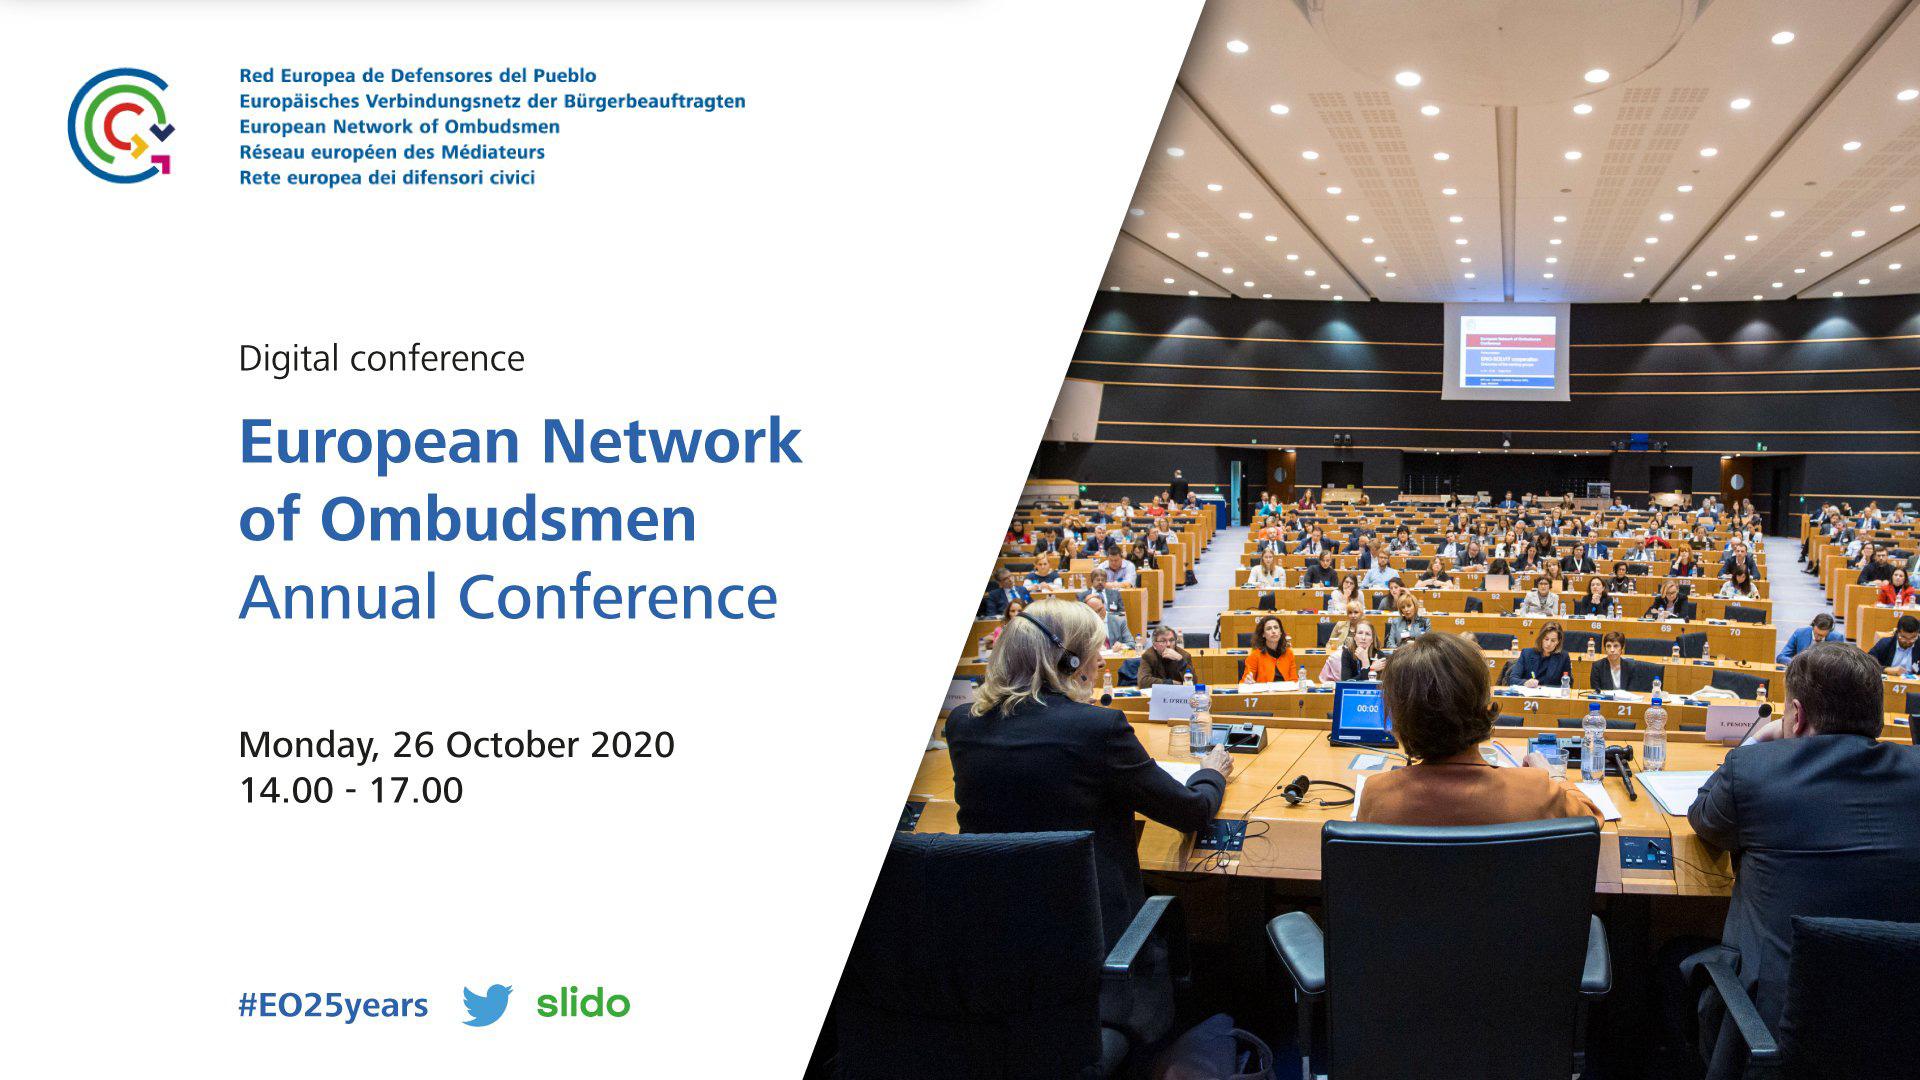 Europeiska ombudsmannanätverket